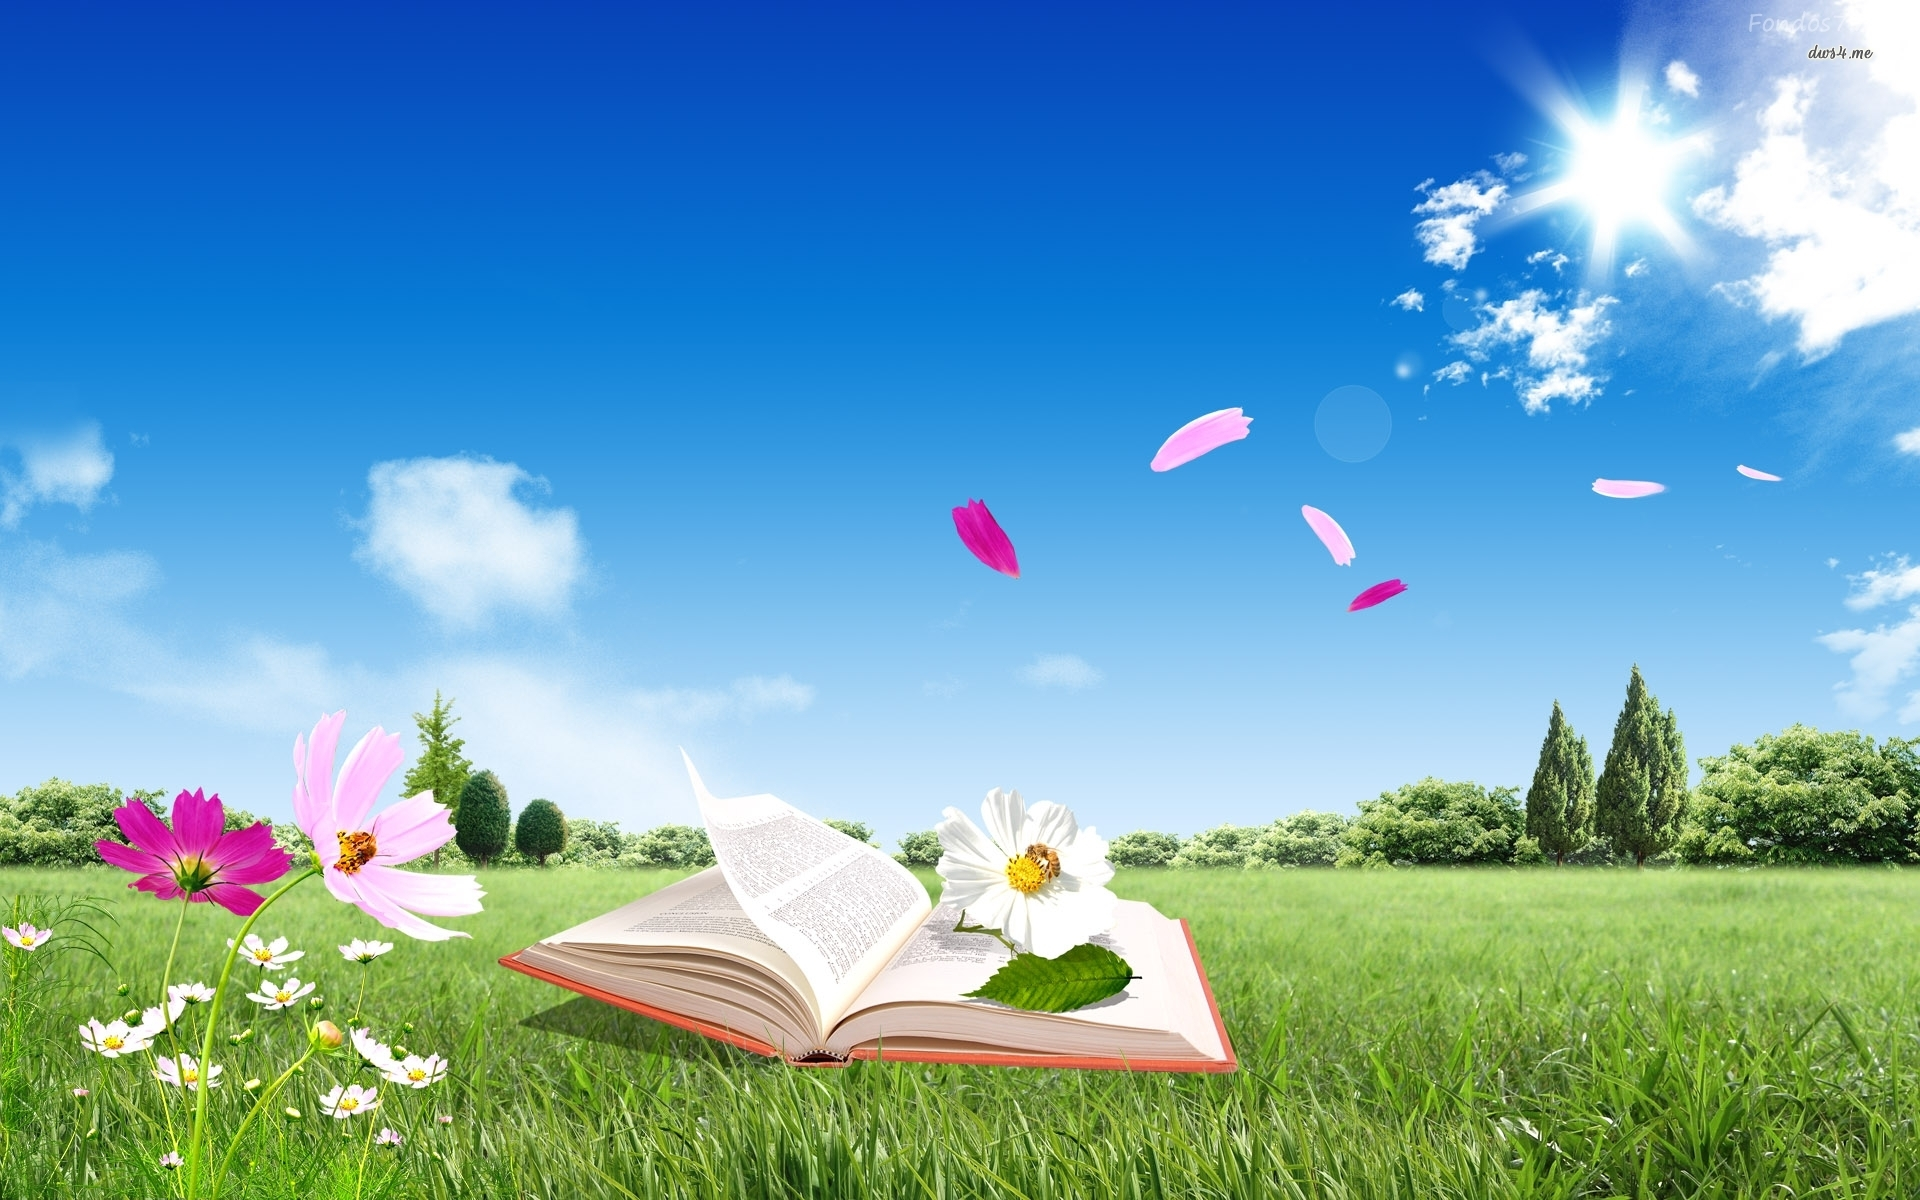 Open Book This Summer - Open Book This Summer